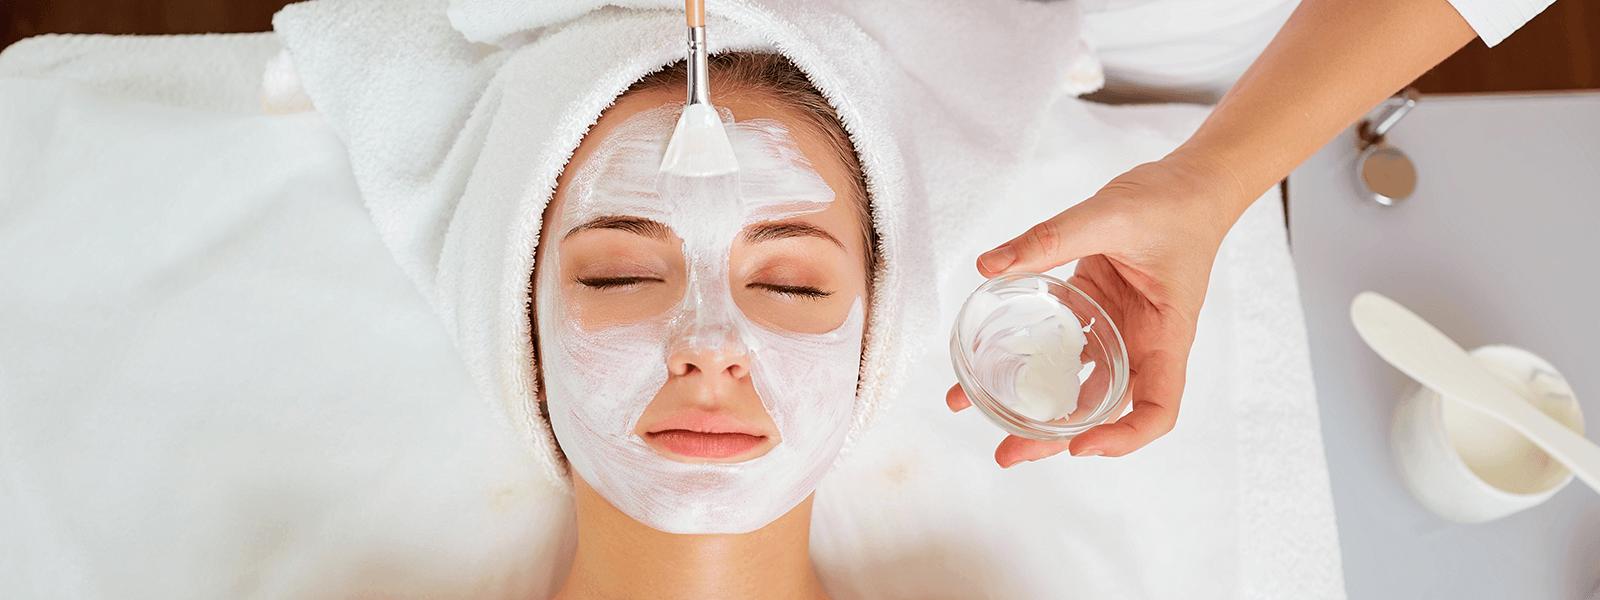 Frau bekommt Gesichtsbehandlung